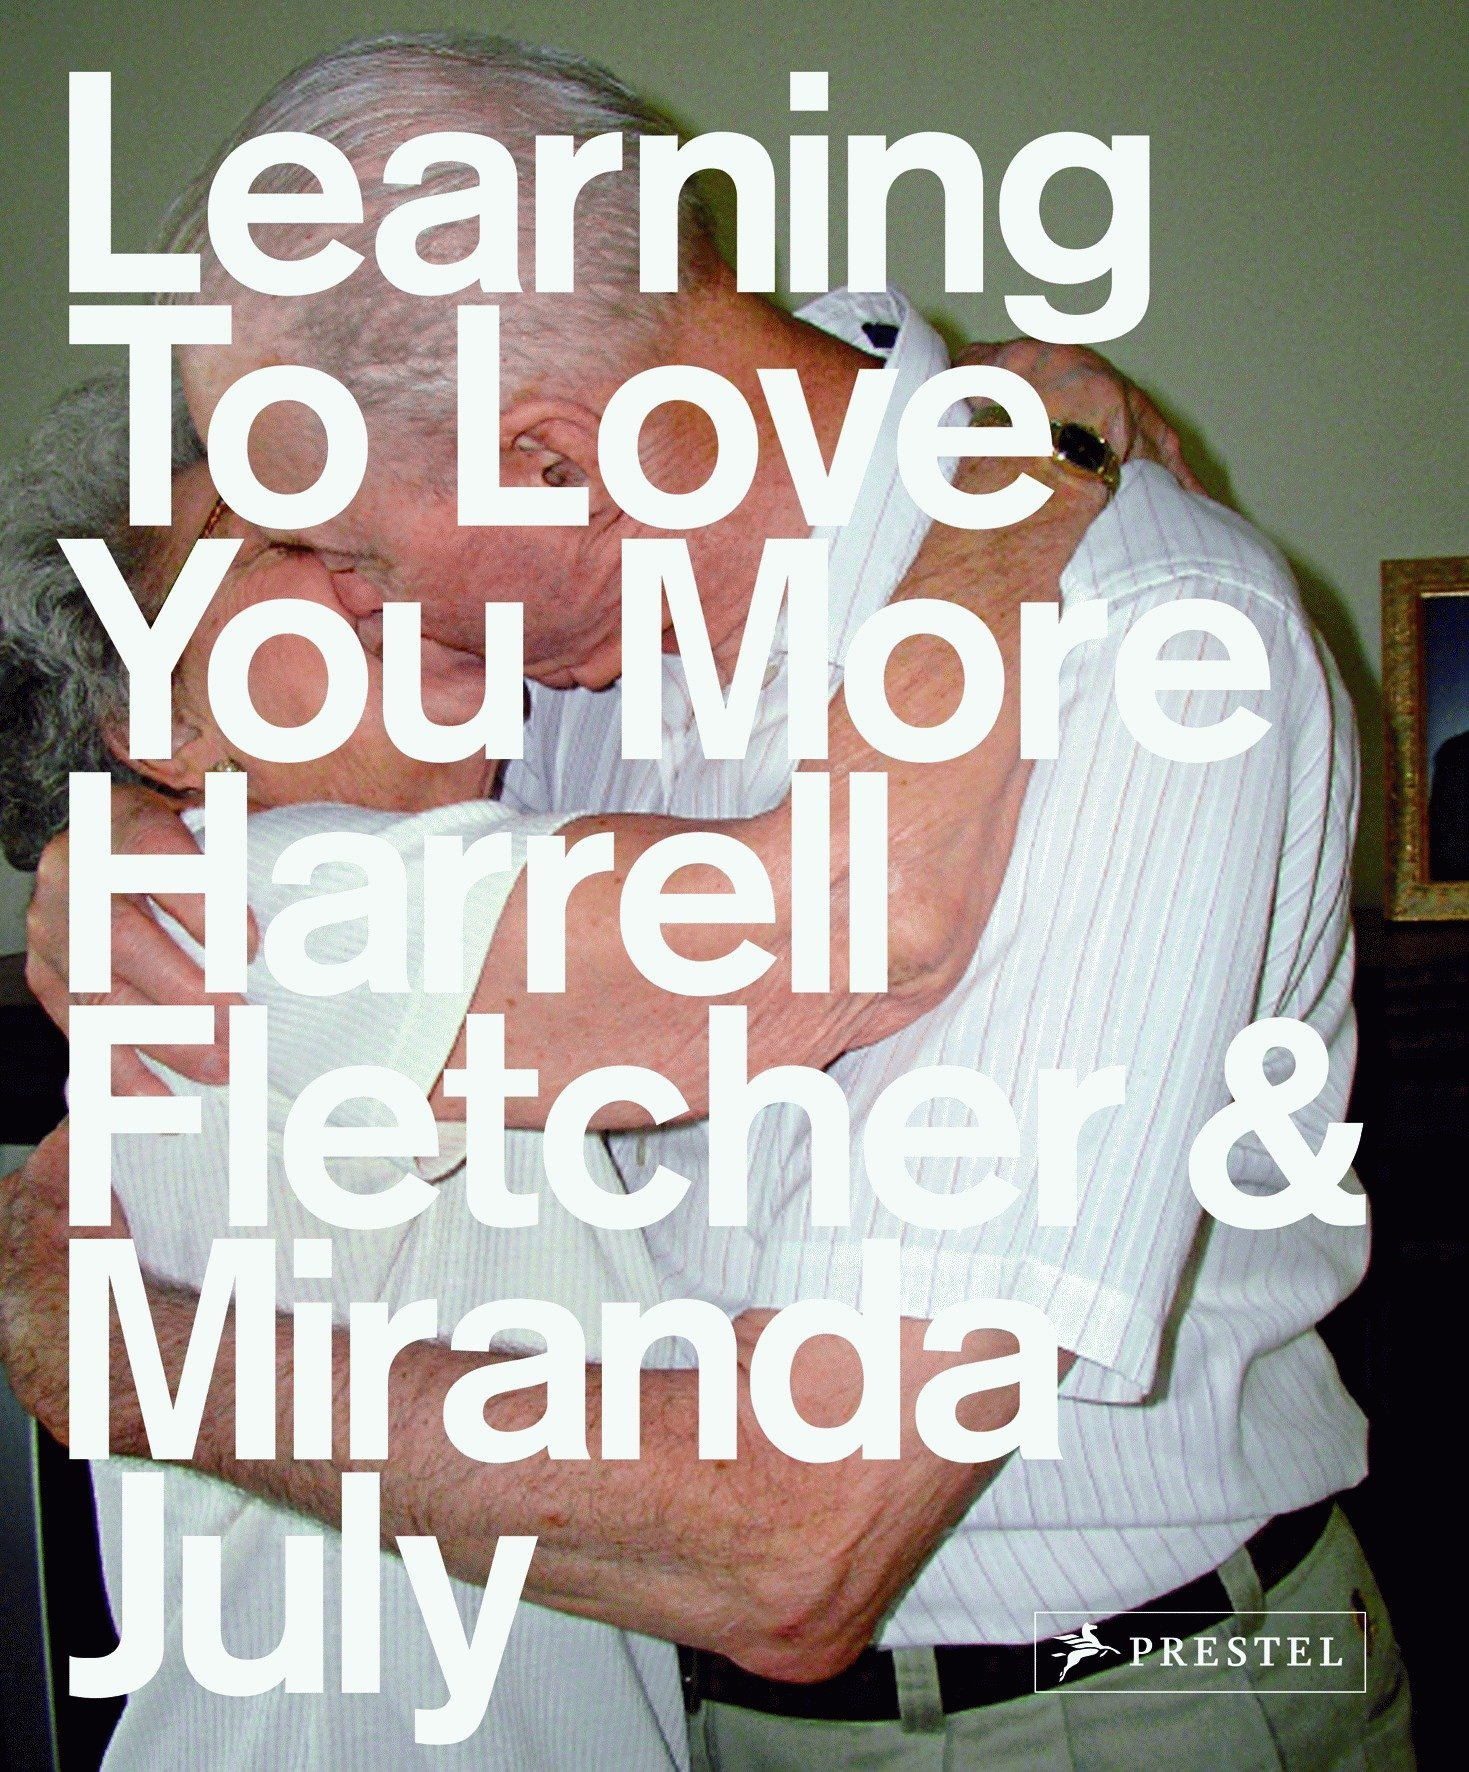 Learning to Love You More Paperback – September 20, 2007 Miranda July Harrell Fletcher Prestel 3791337335